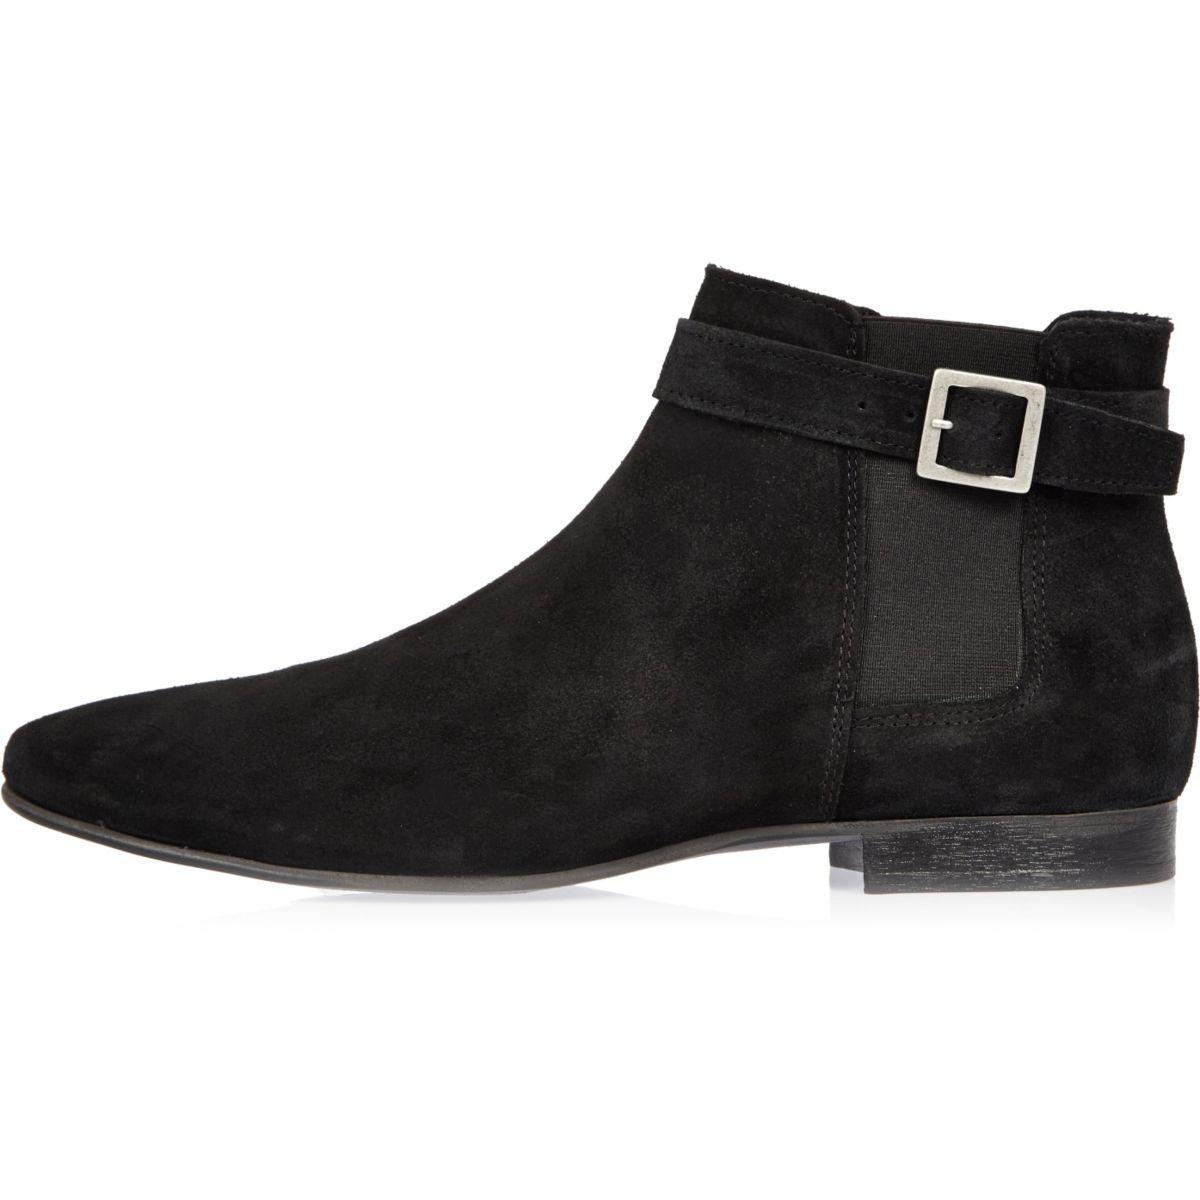 Schwarze Chelsea-Stiefel mit Schnallenriemen